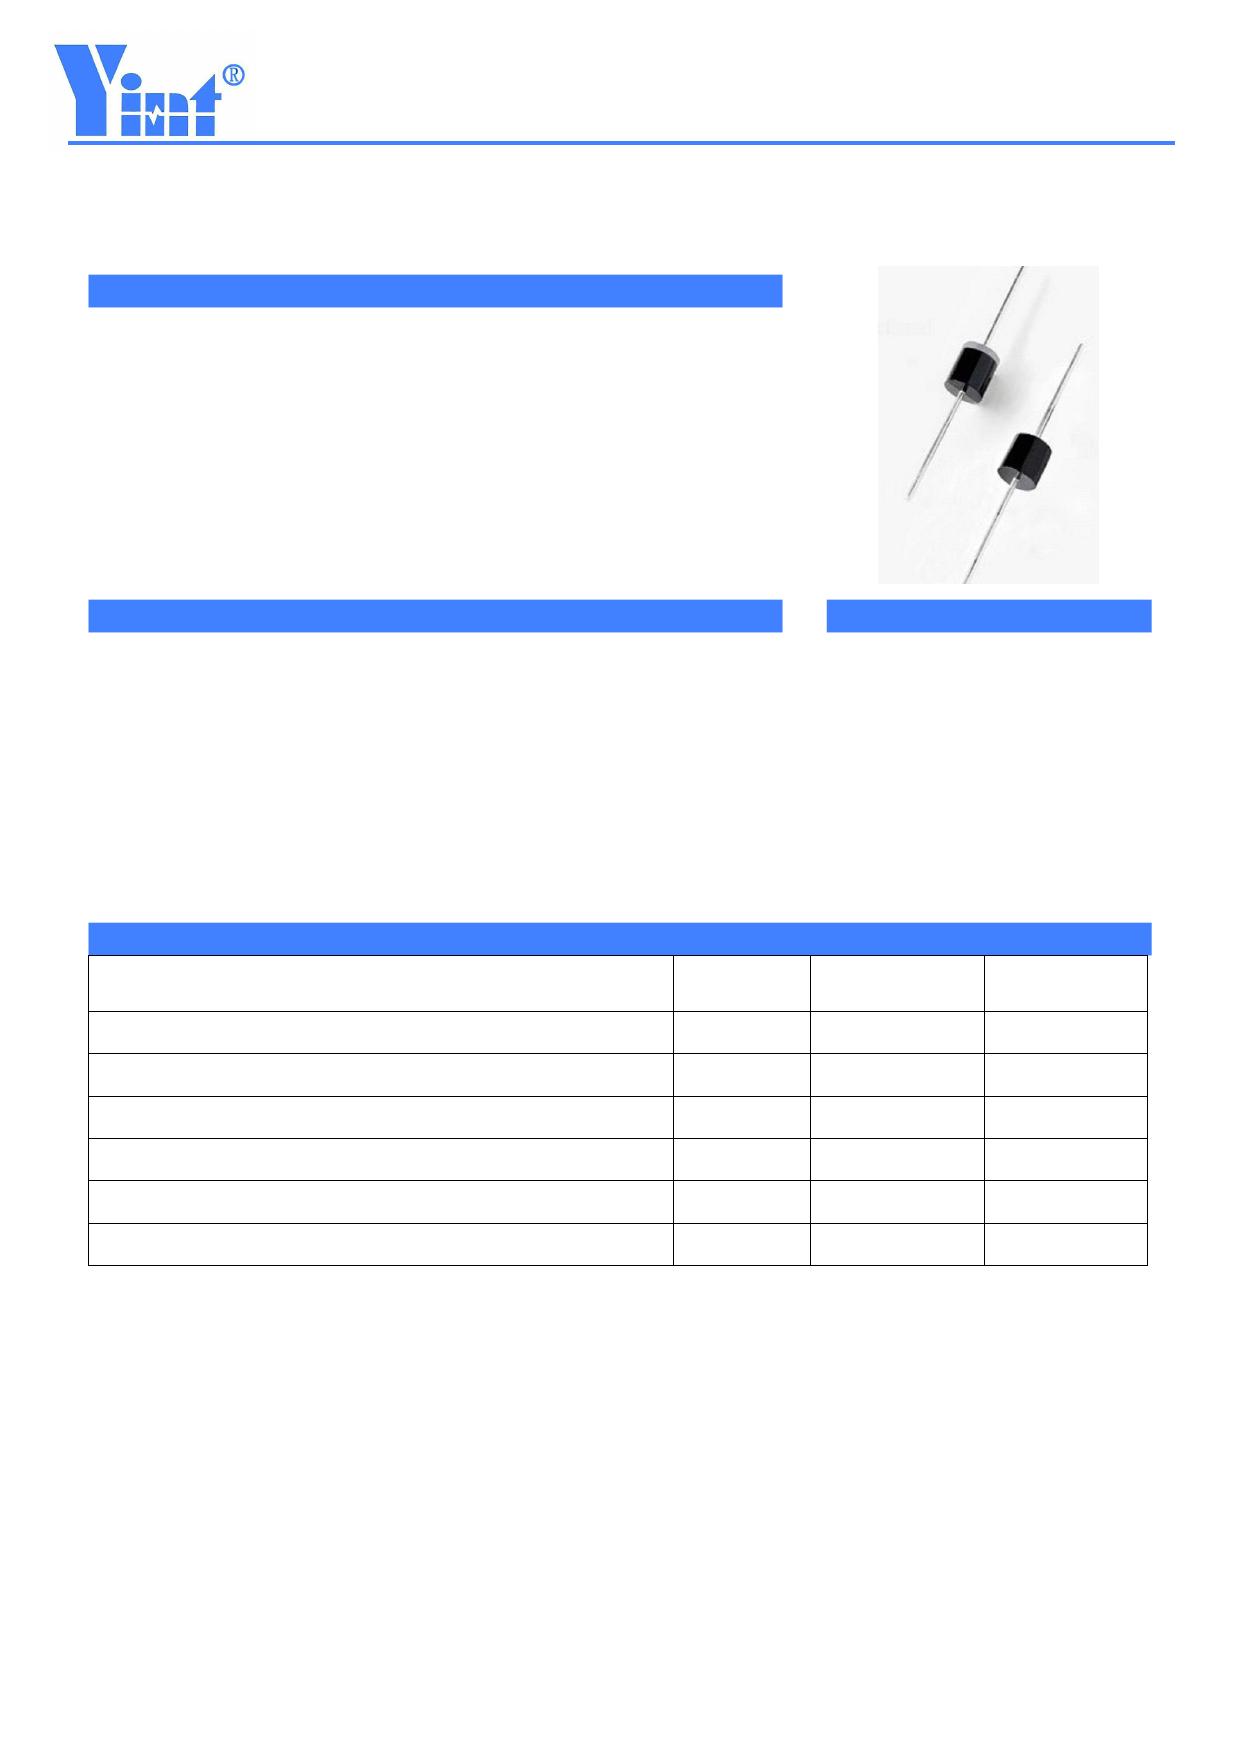 3.0KP180A Hoja de datos, Descripción, Manual